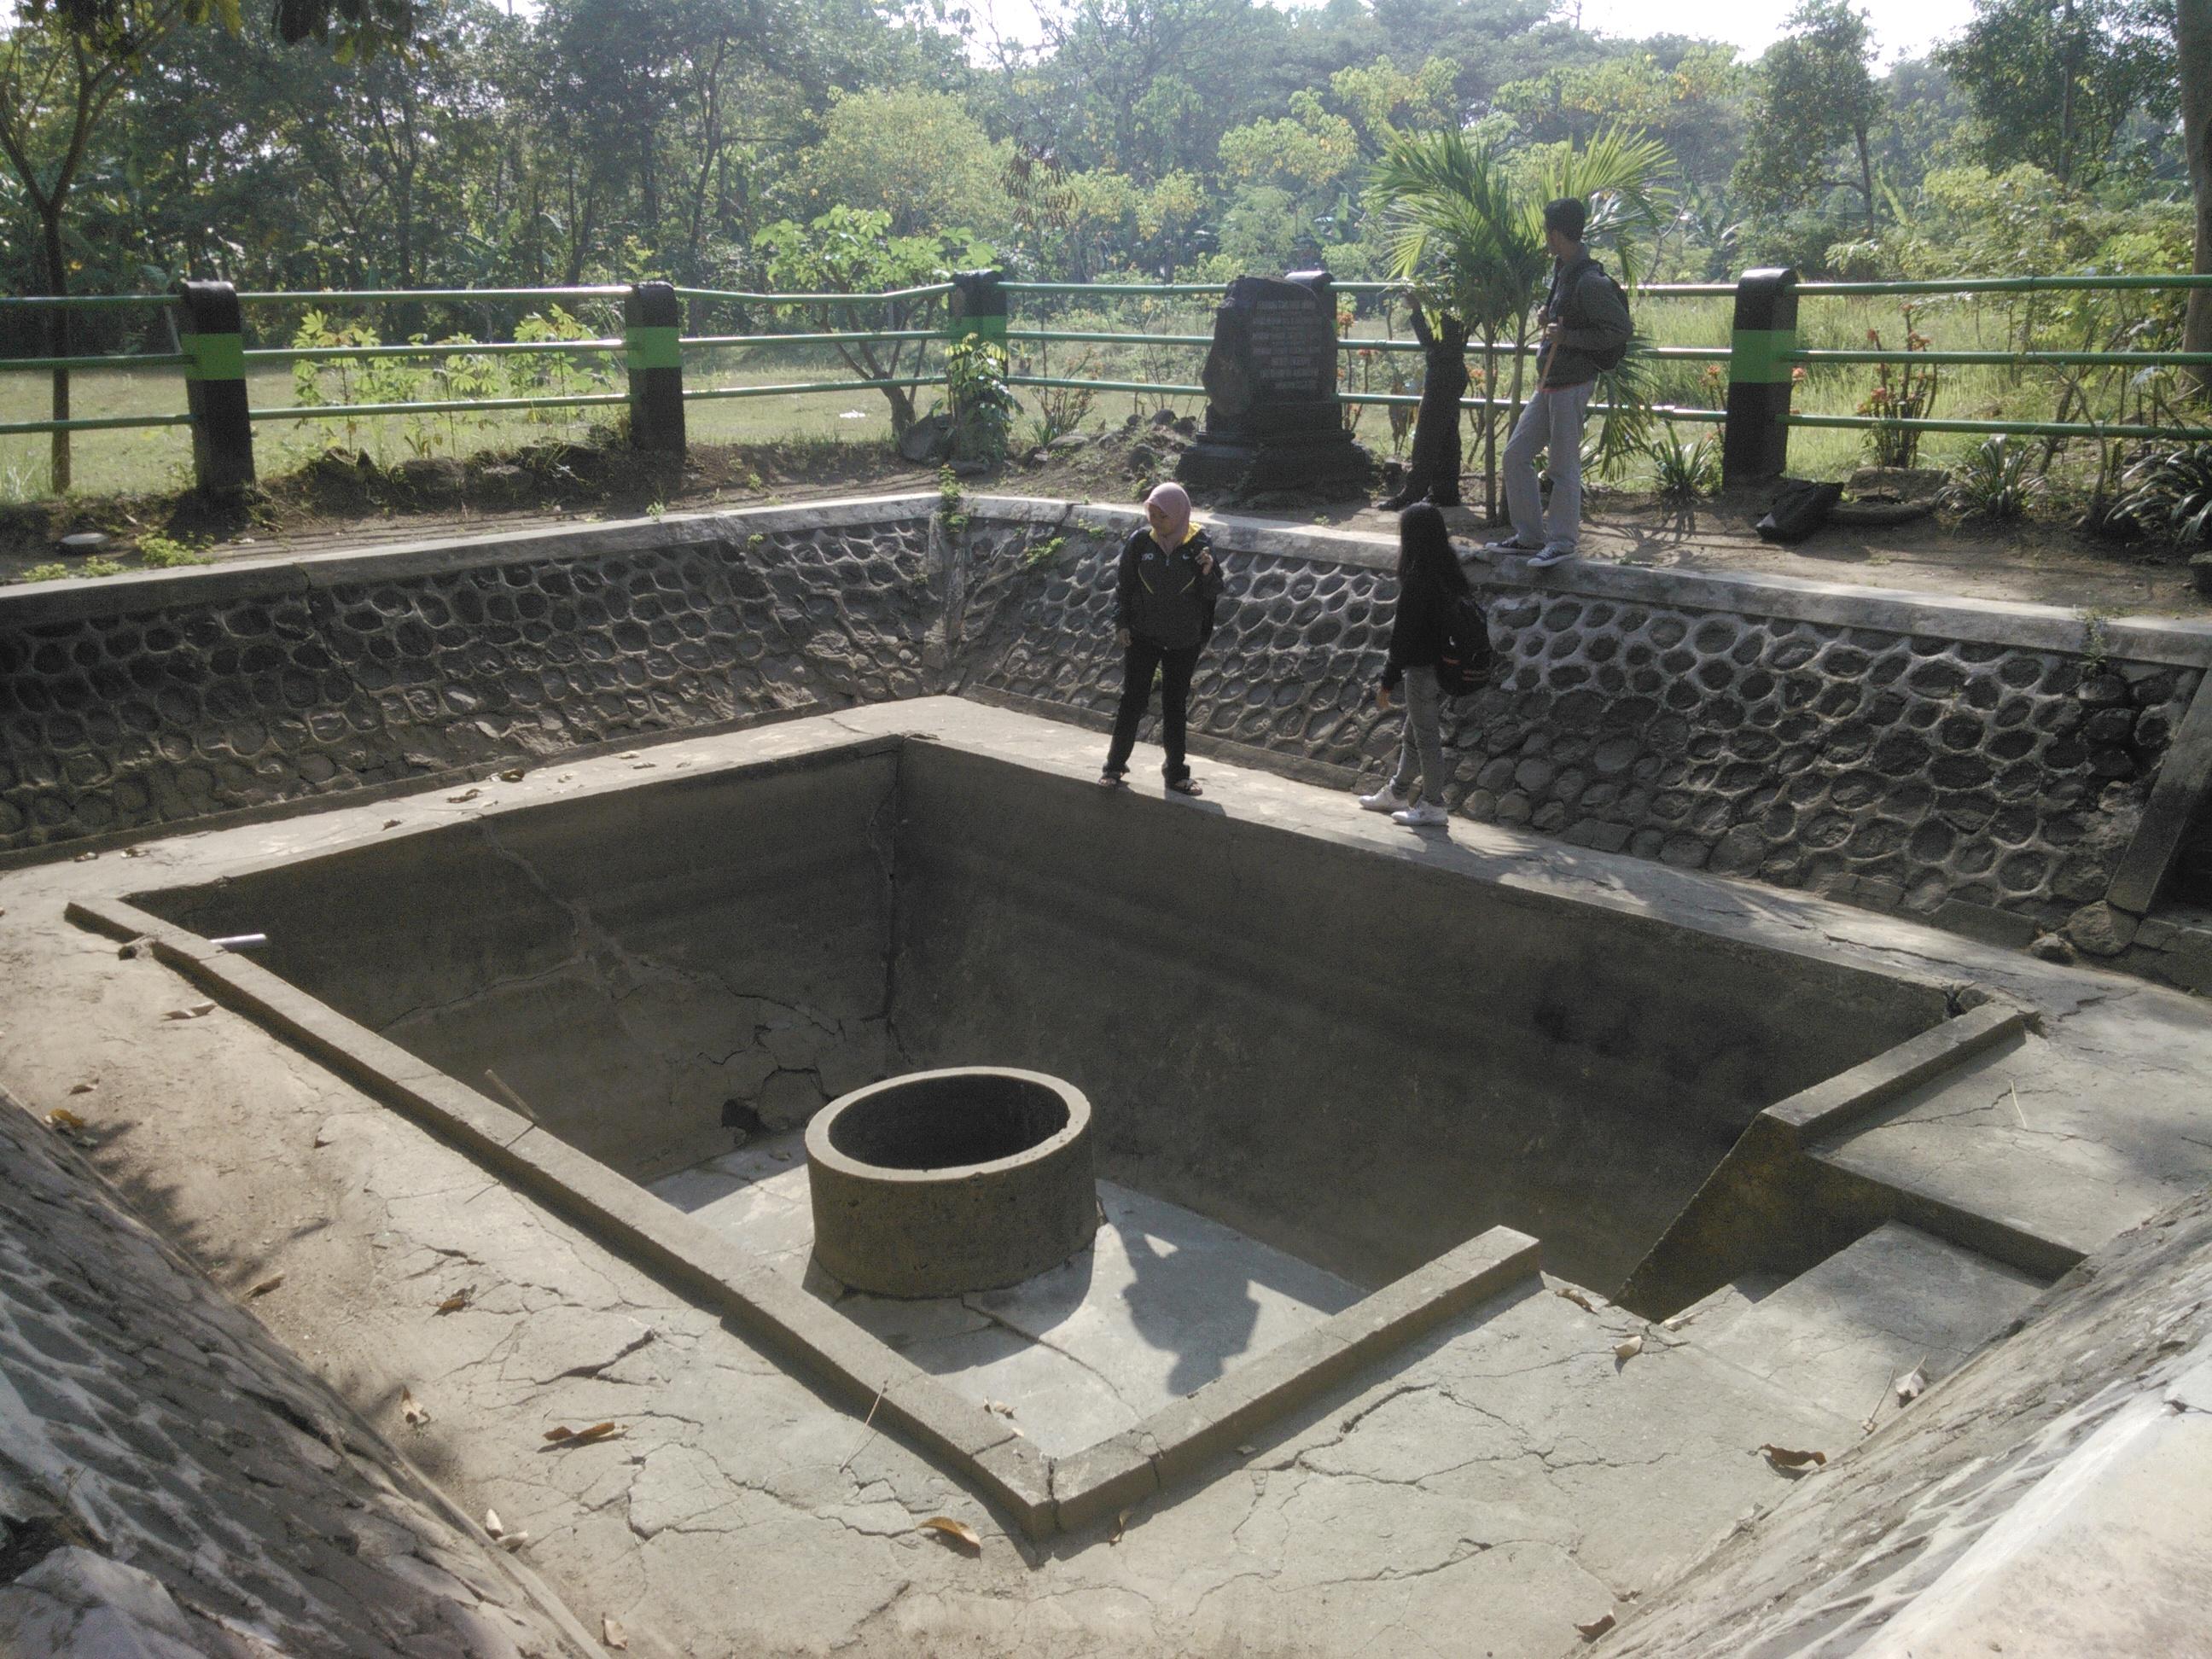 Sendhang Asal Kota Madiun Makam Masjid Kuno Taman Kab